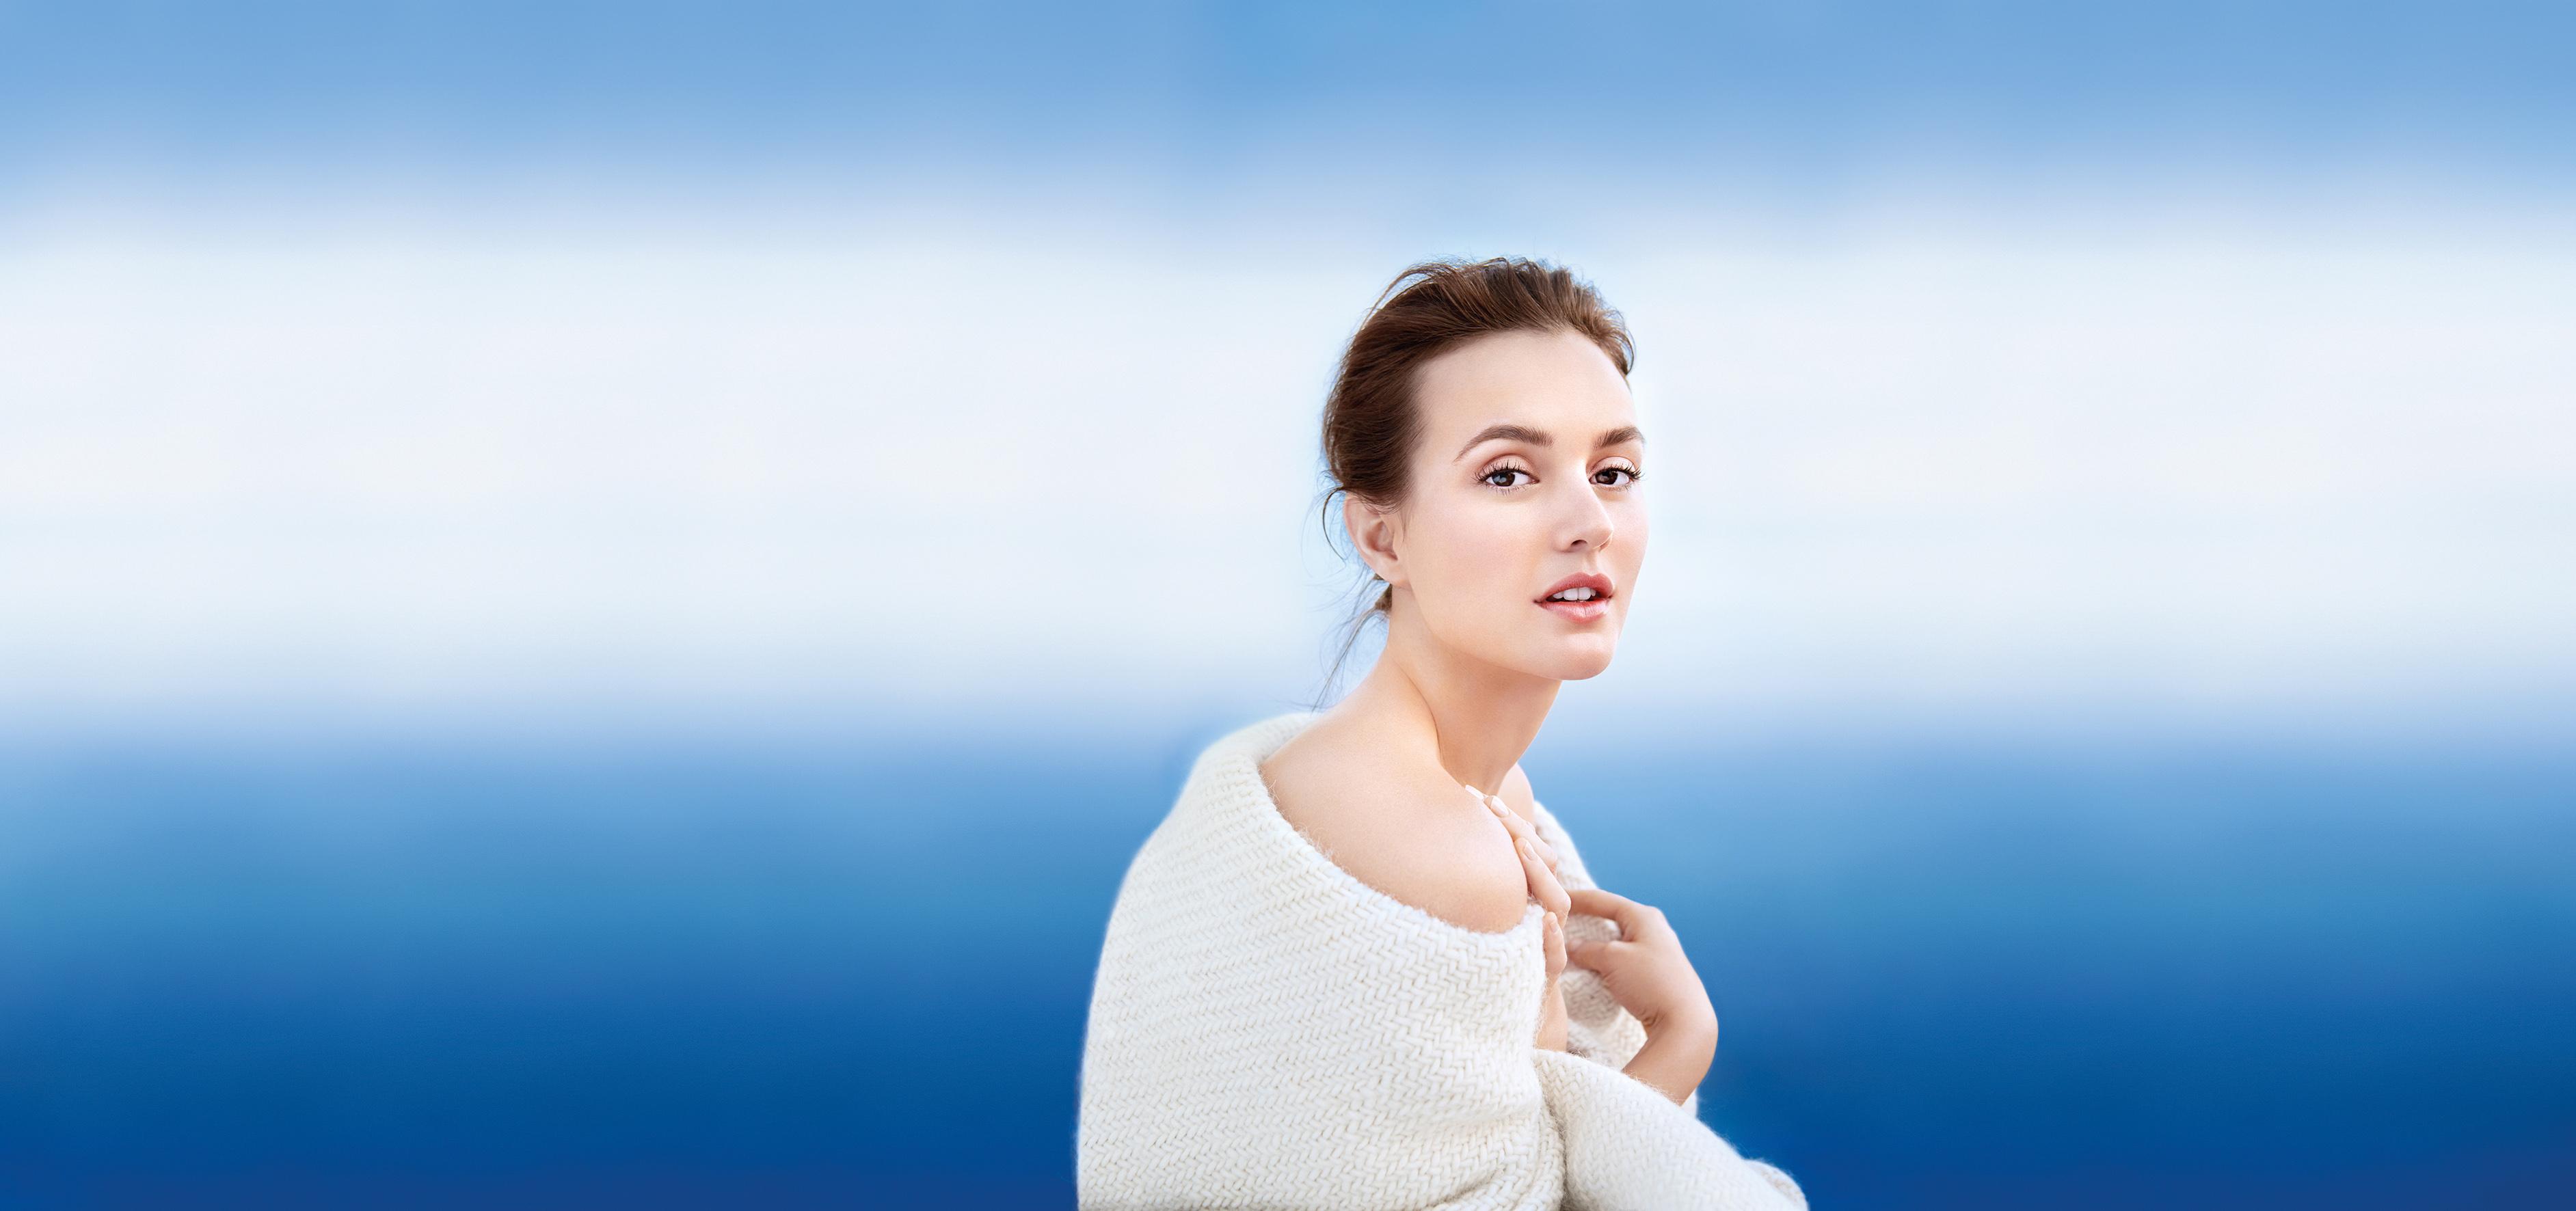 La actriz Leighton Meester publicita Aquasource Cocoon, de Biotherm